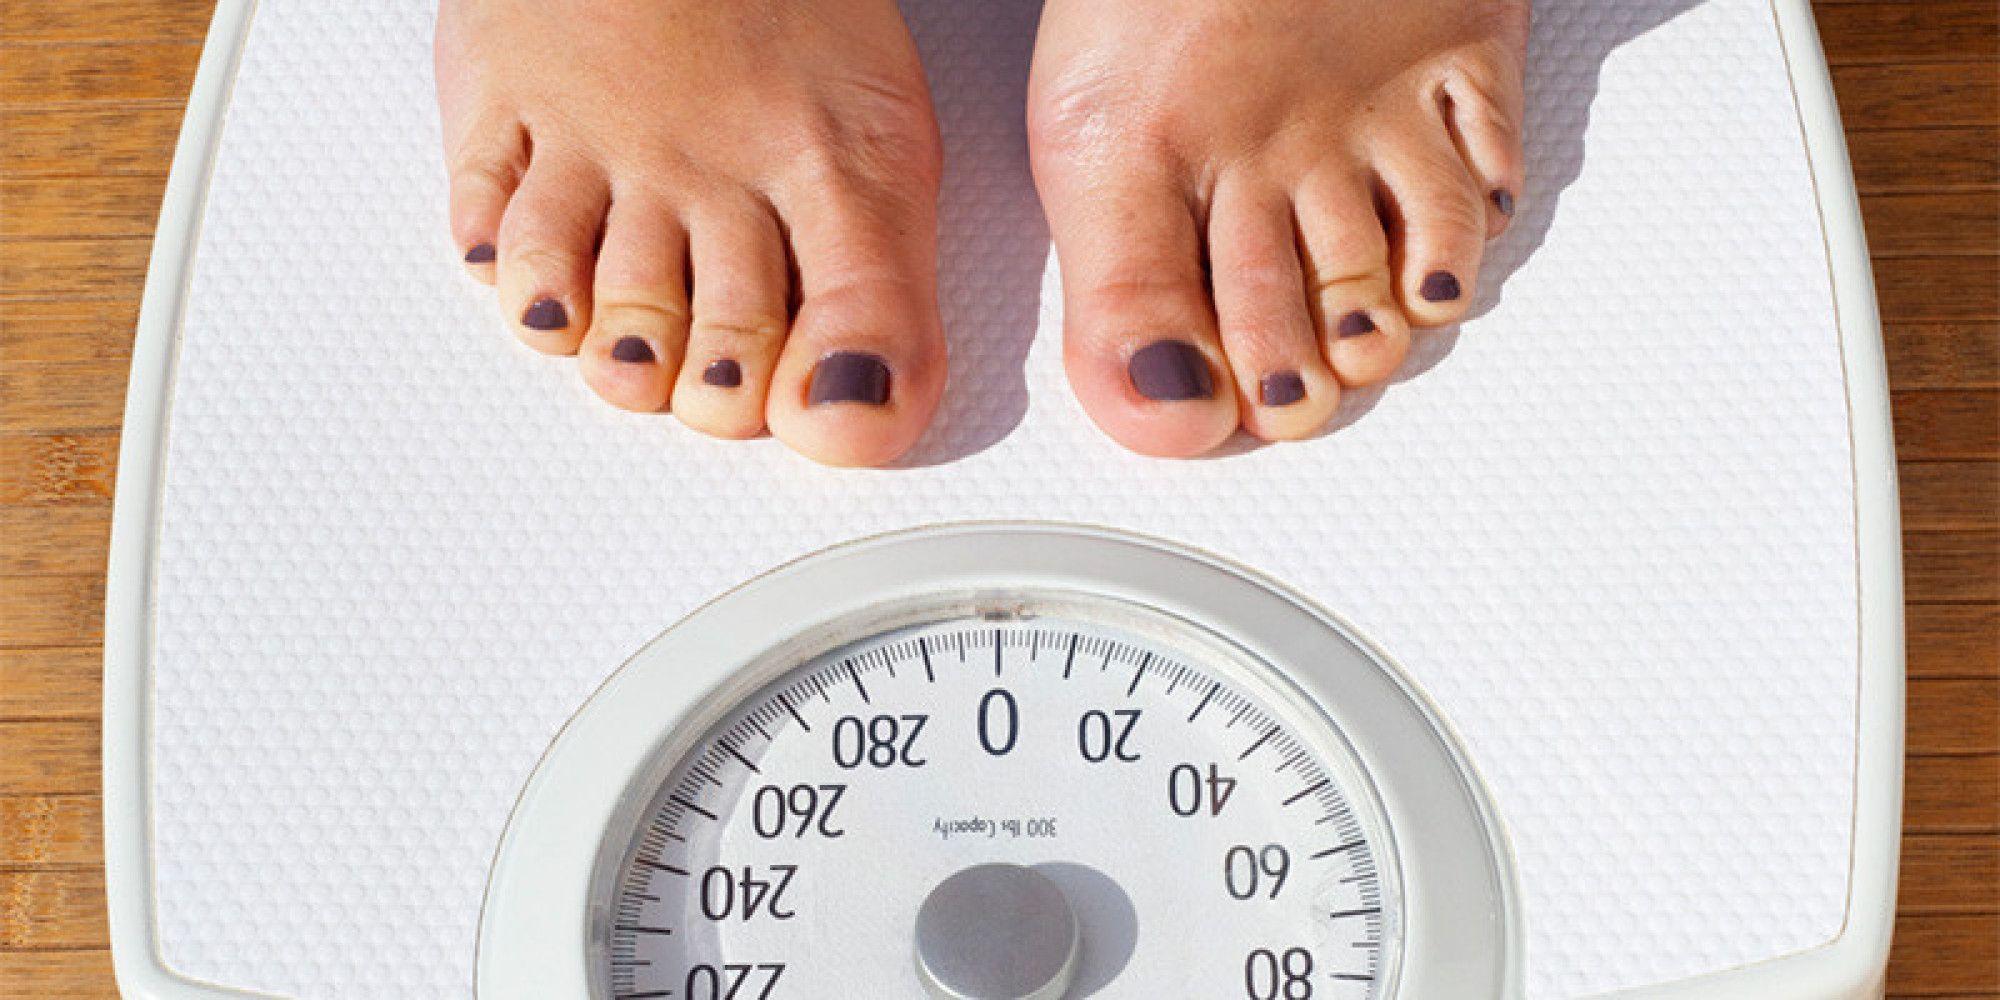 18 lb weight loss photo 2